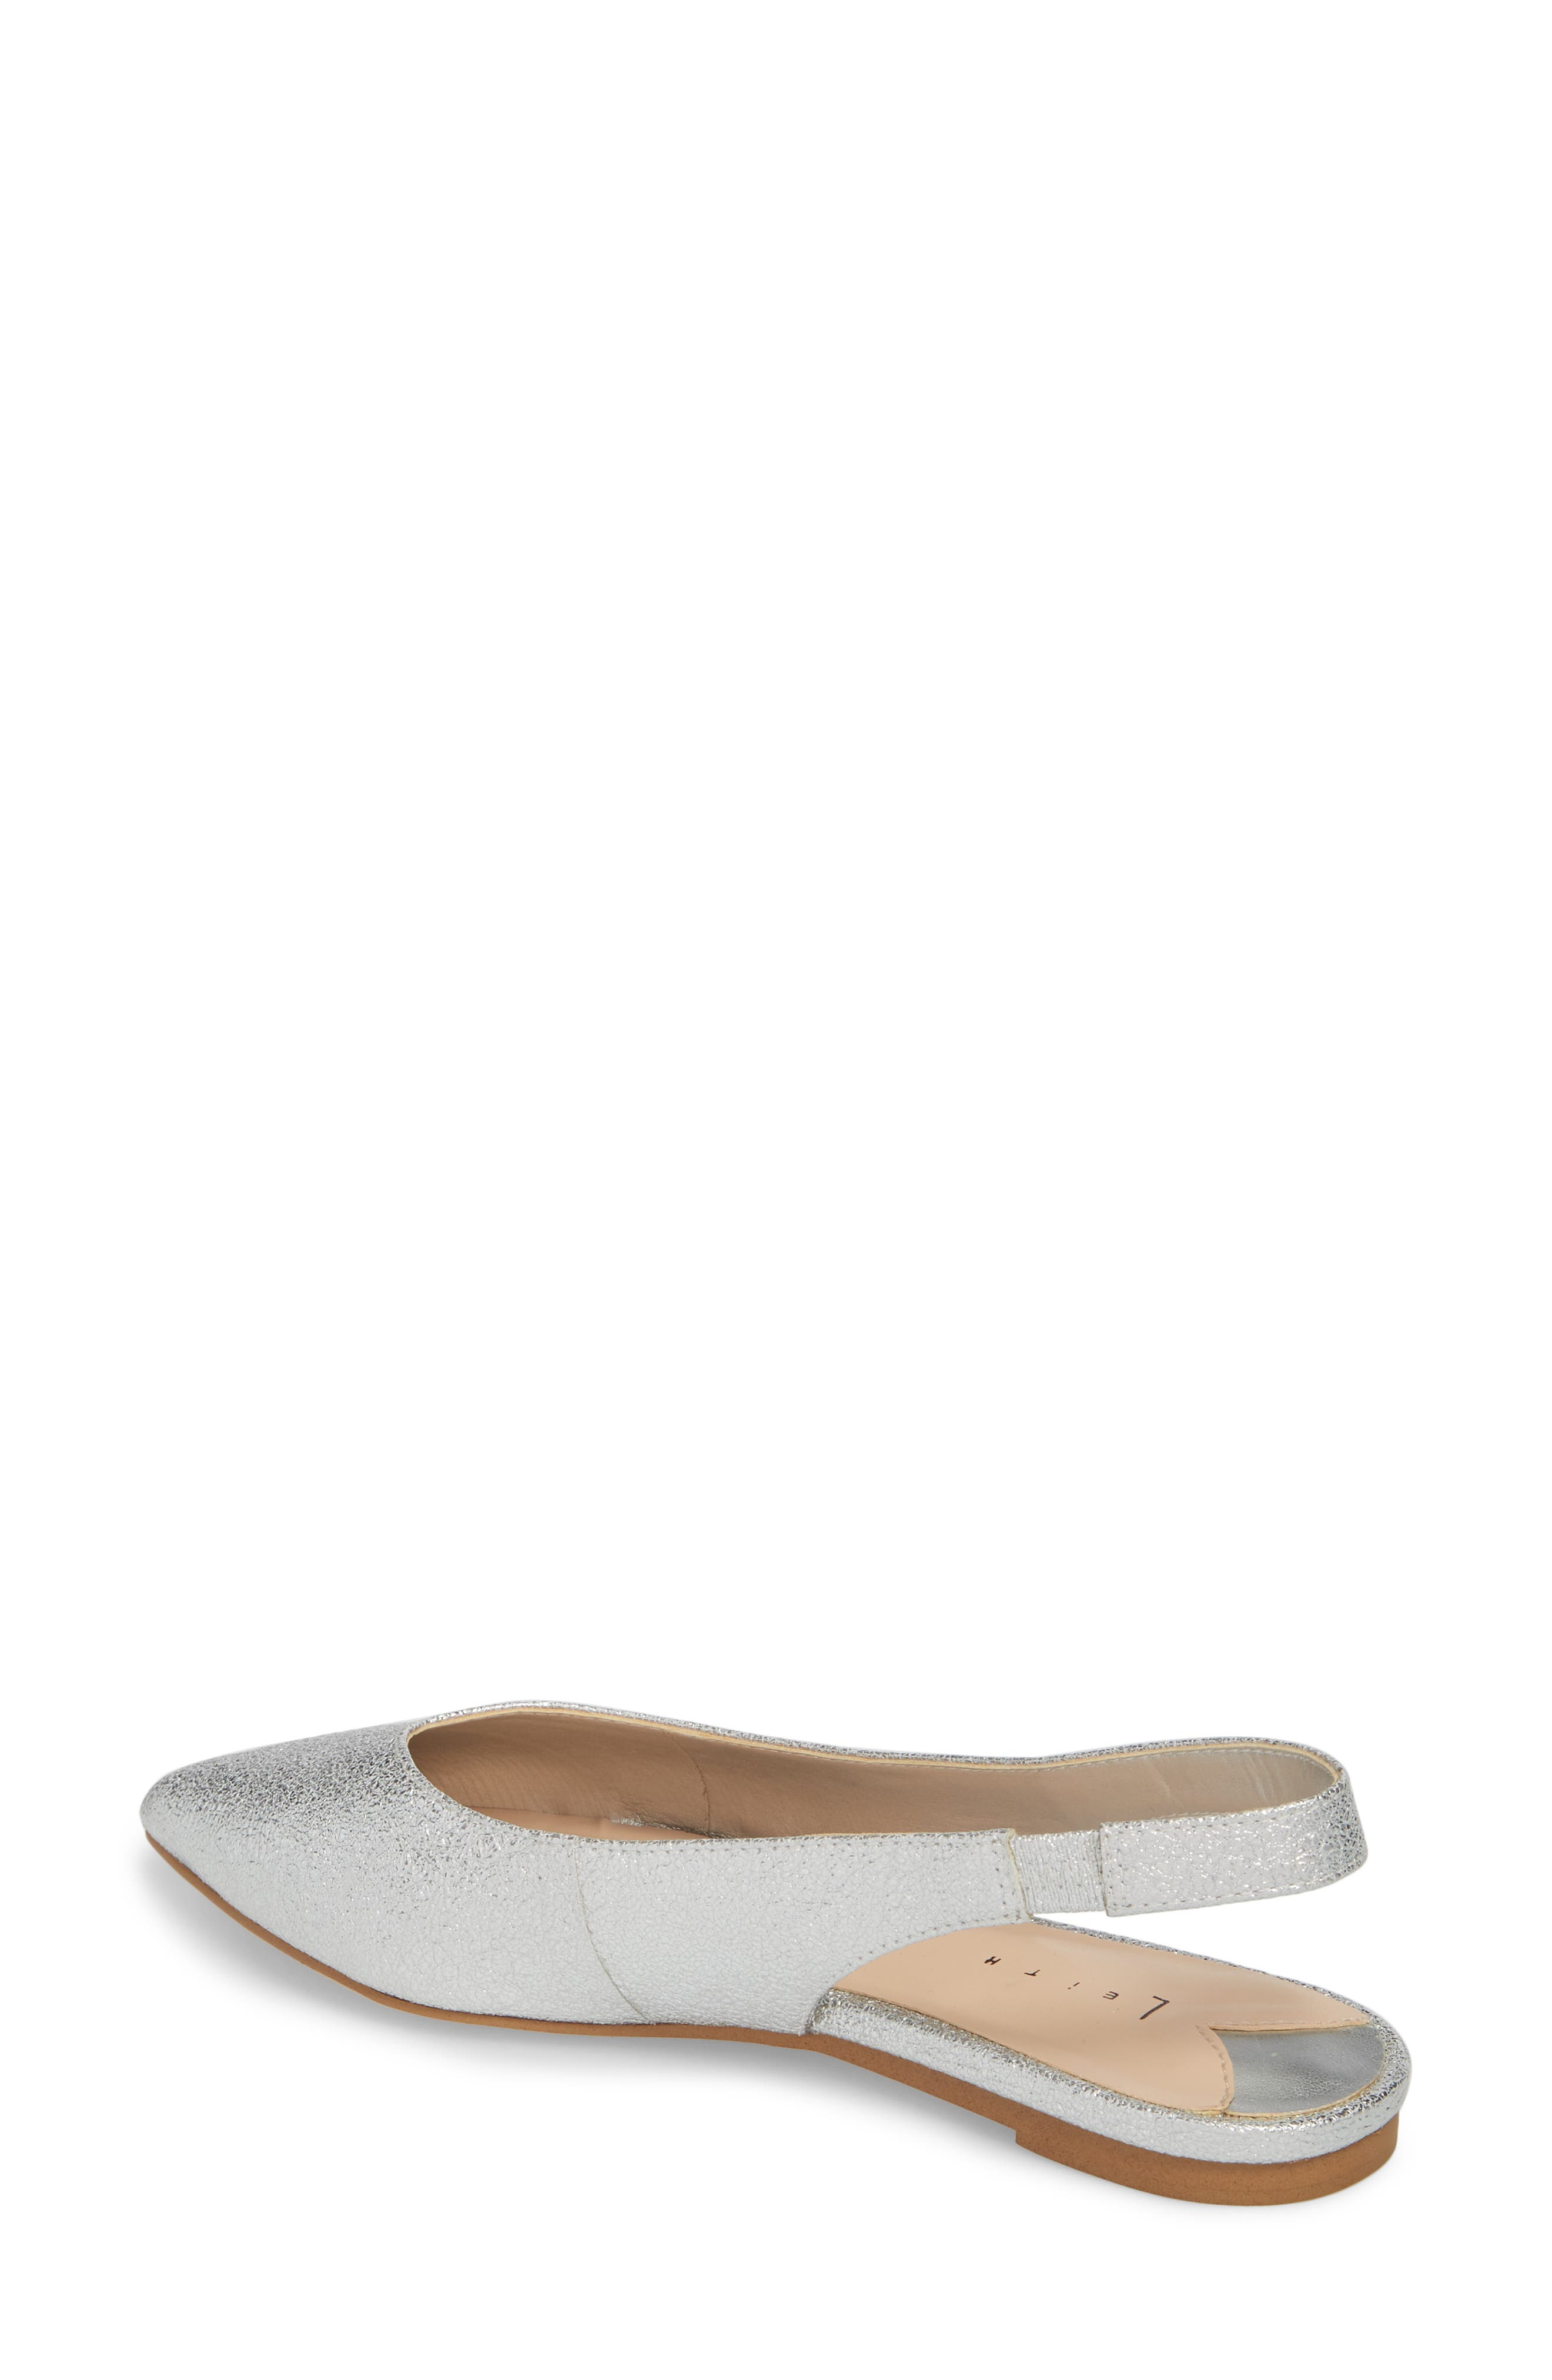 Masonn Slingback Flat,                             Alternate thumbnail 2, color,                             Silver Crackle Faux Leather